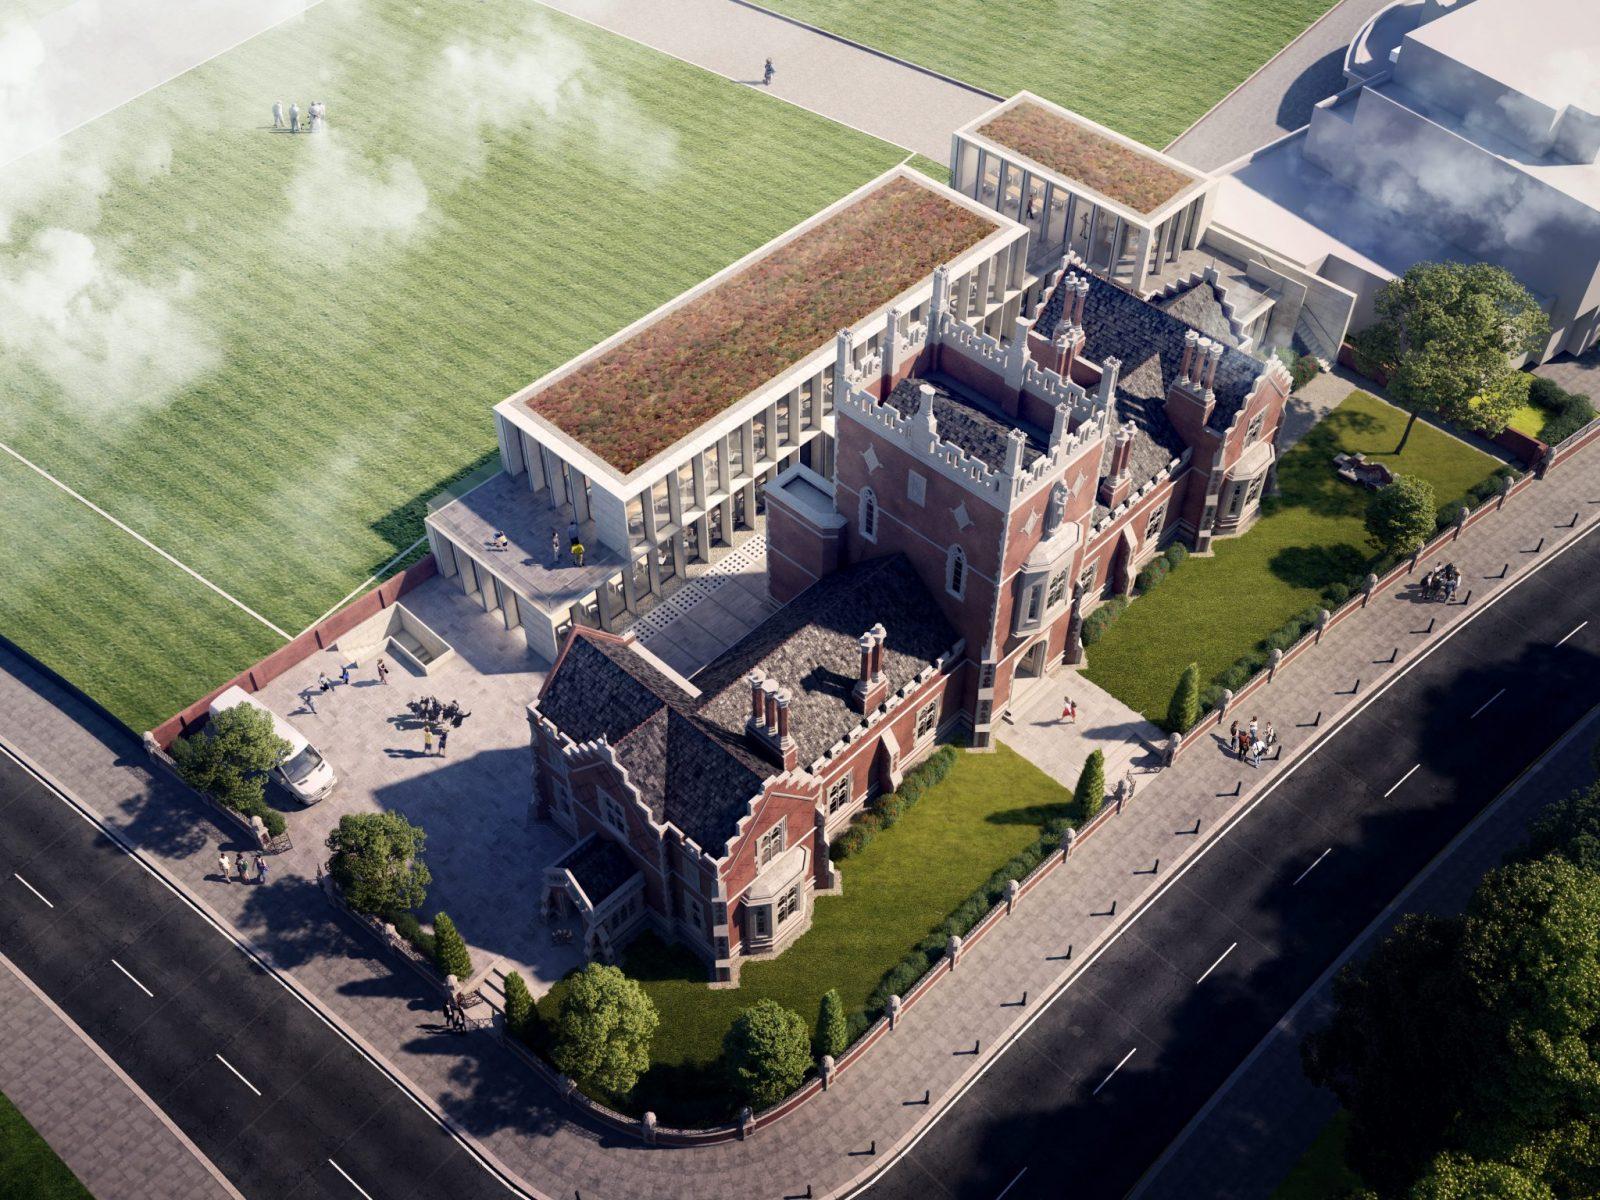 The Castle Club School, Fulham, London SW6